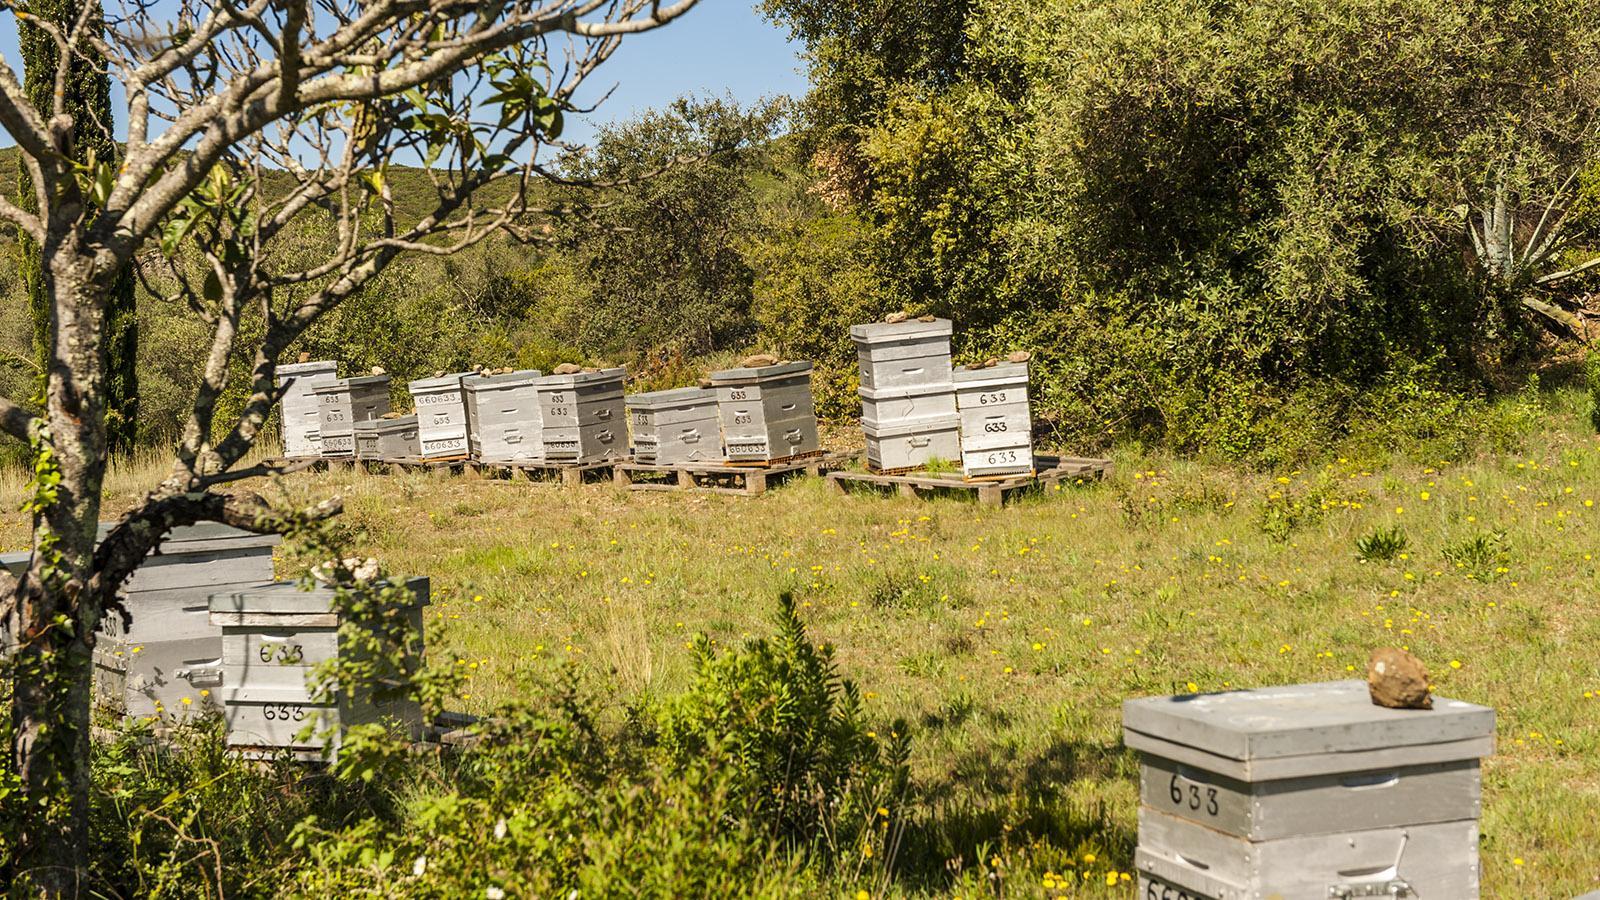 Die Bienenkörbe der Moulin de Canterrane. Foto: Hilke Maunder